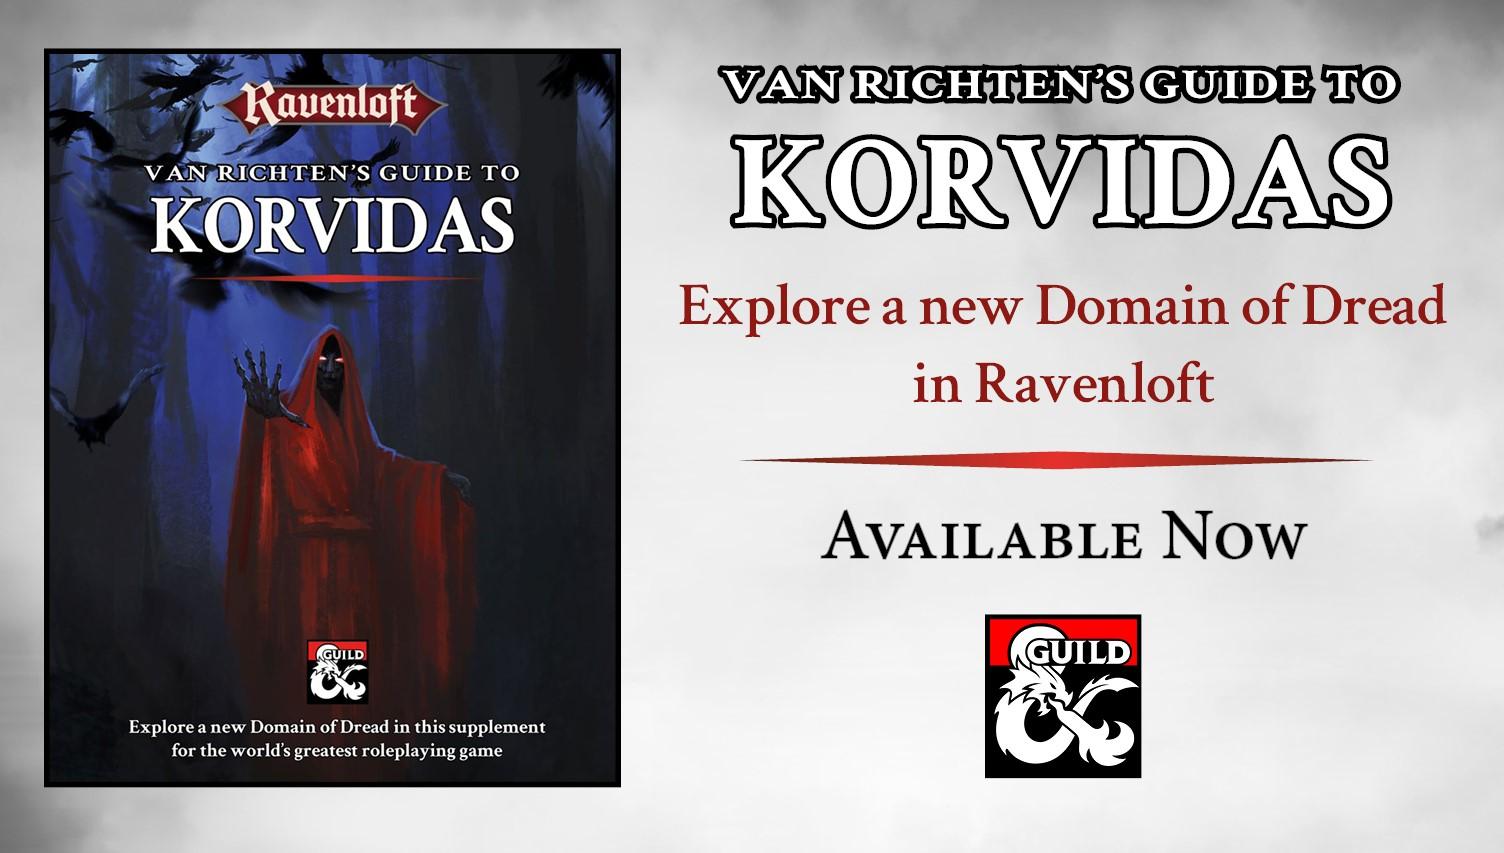 McDonough_-_Korvidas_-_available_now.jpg